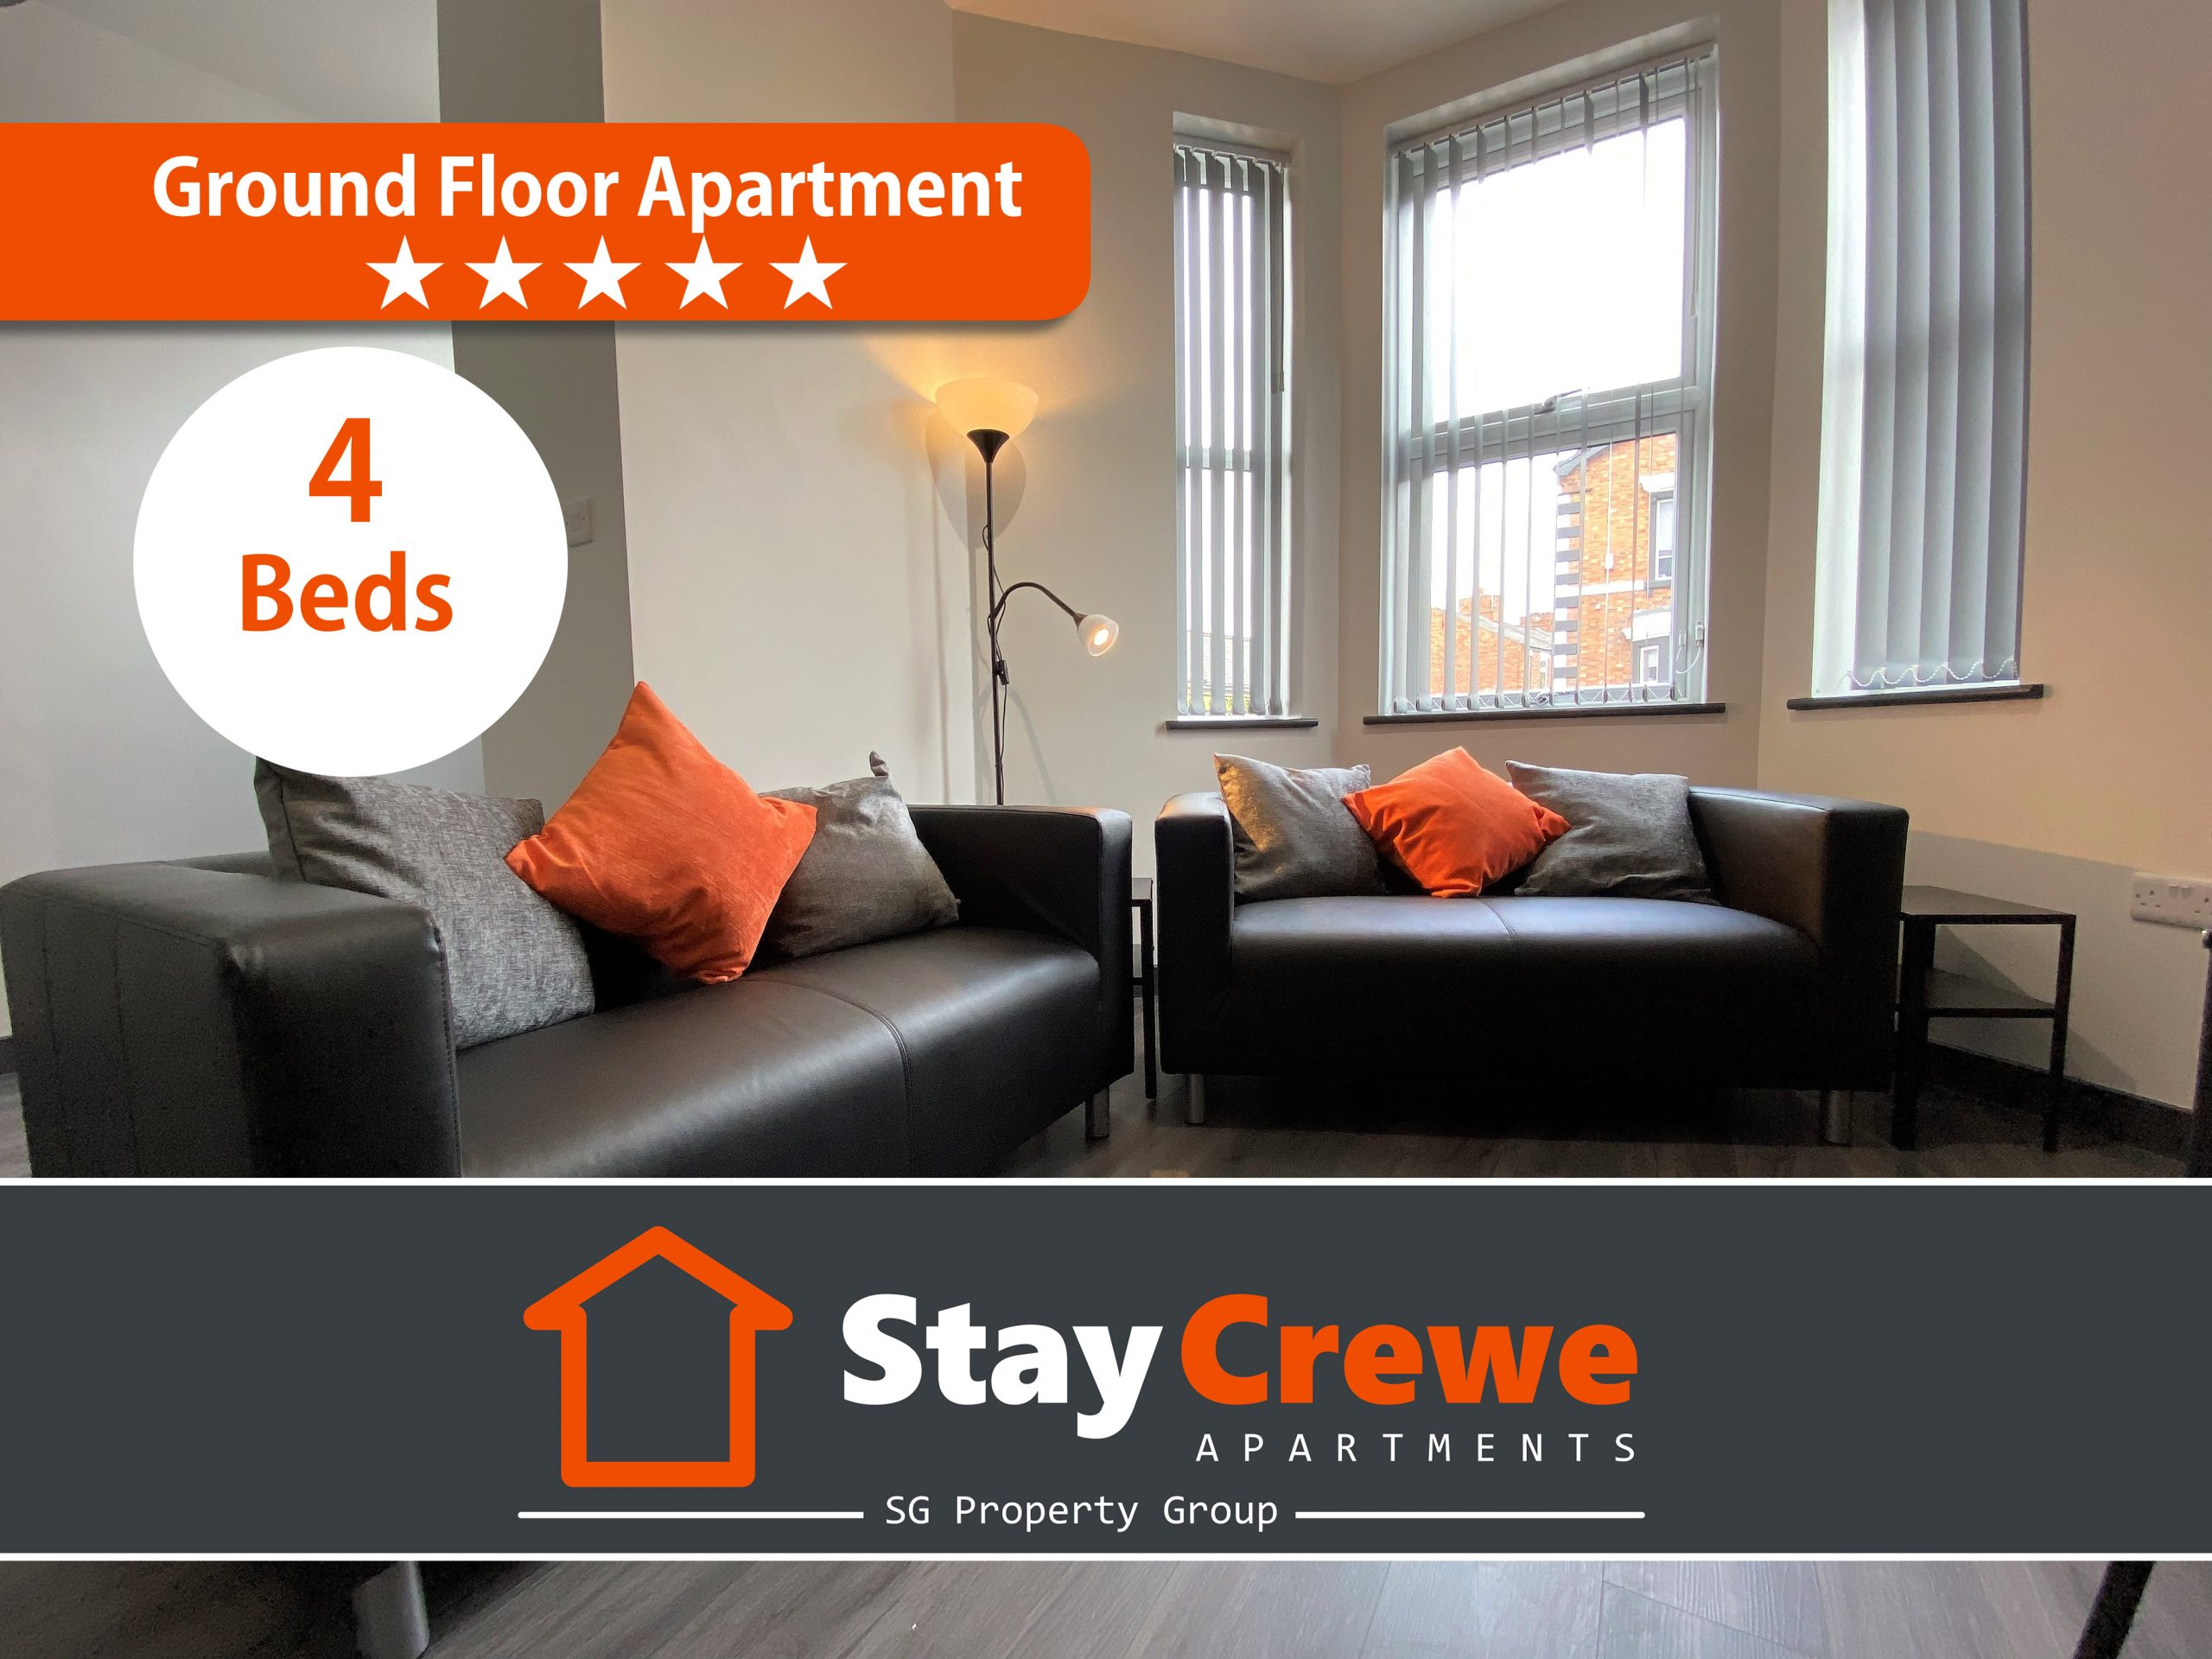 Apartment 130 – StayCrewe